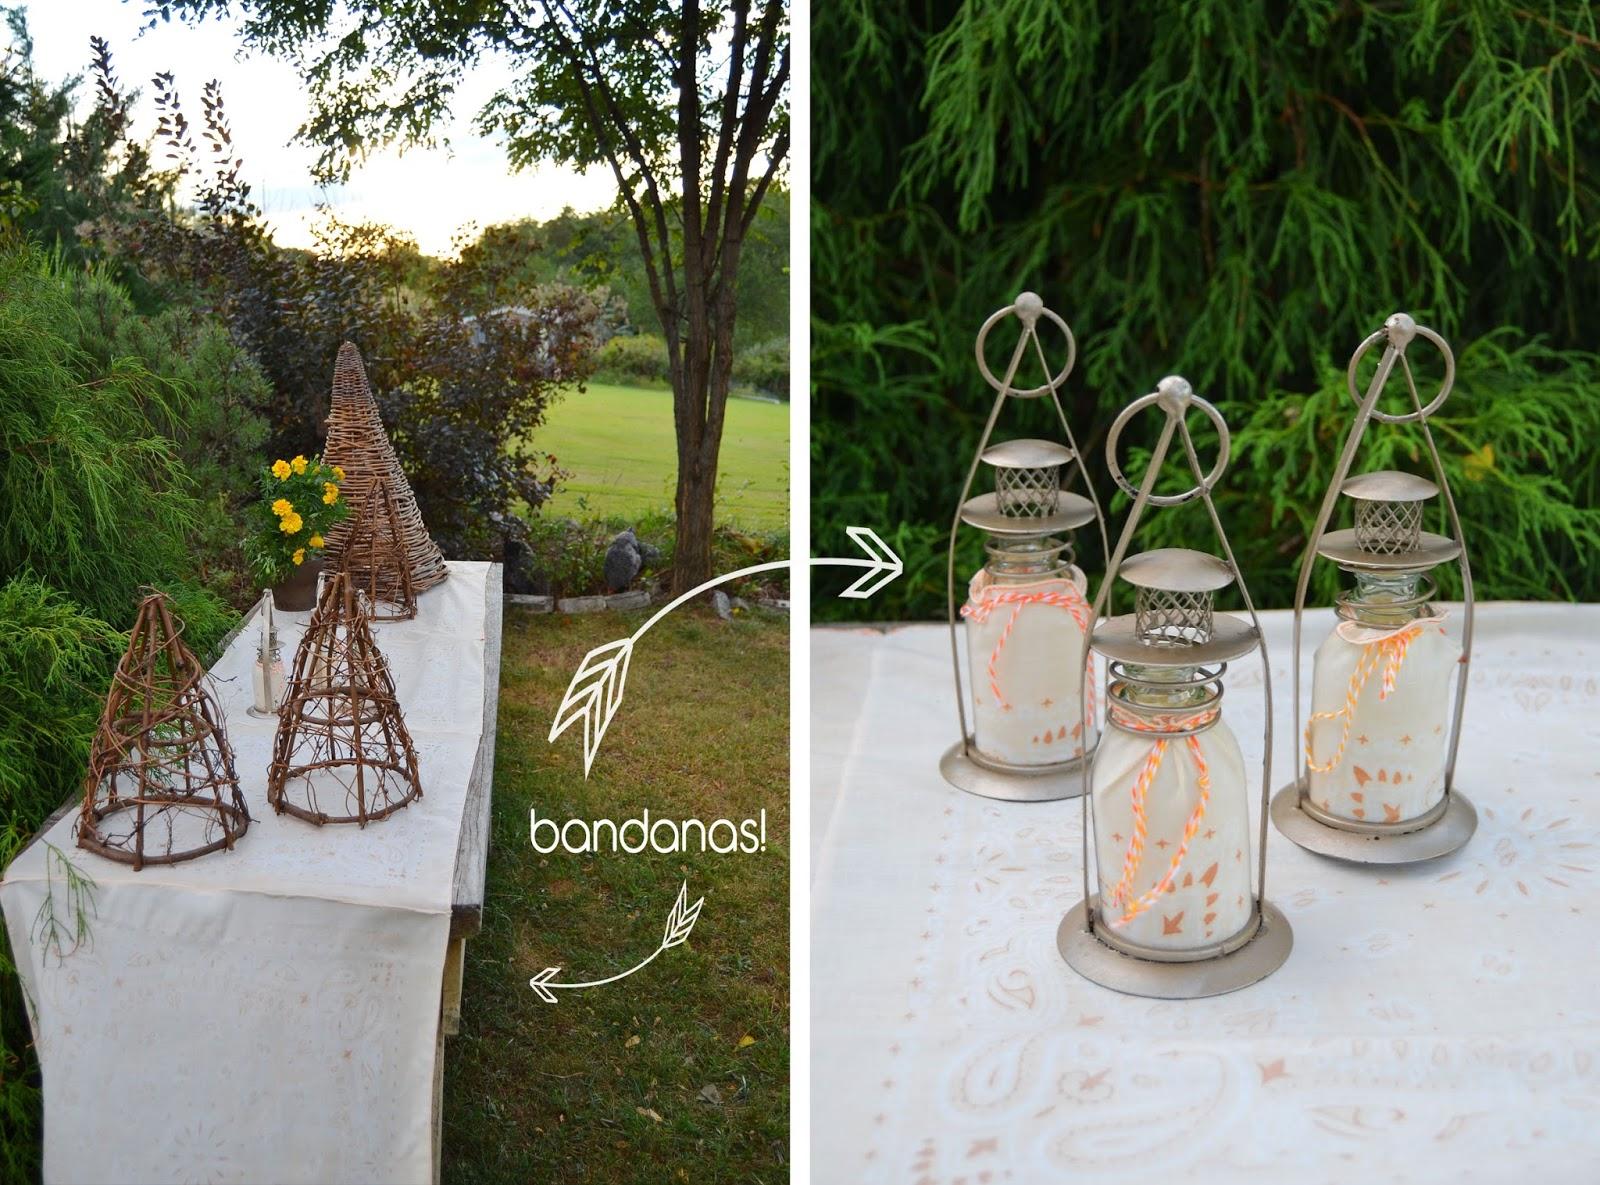 Quick Fade Bleached Bandana Lanterns